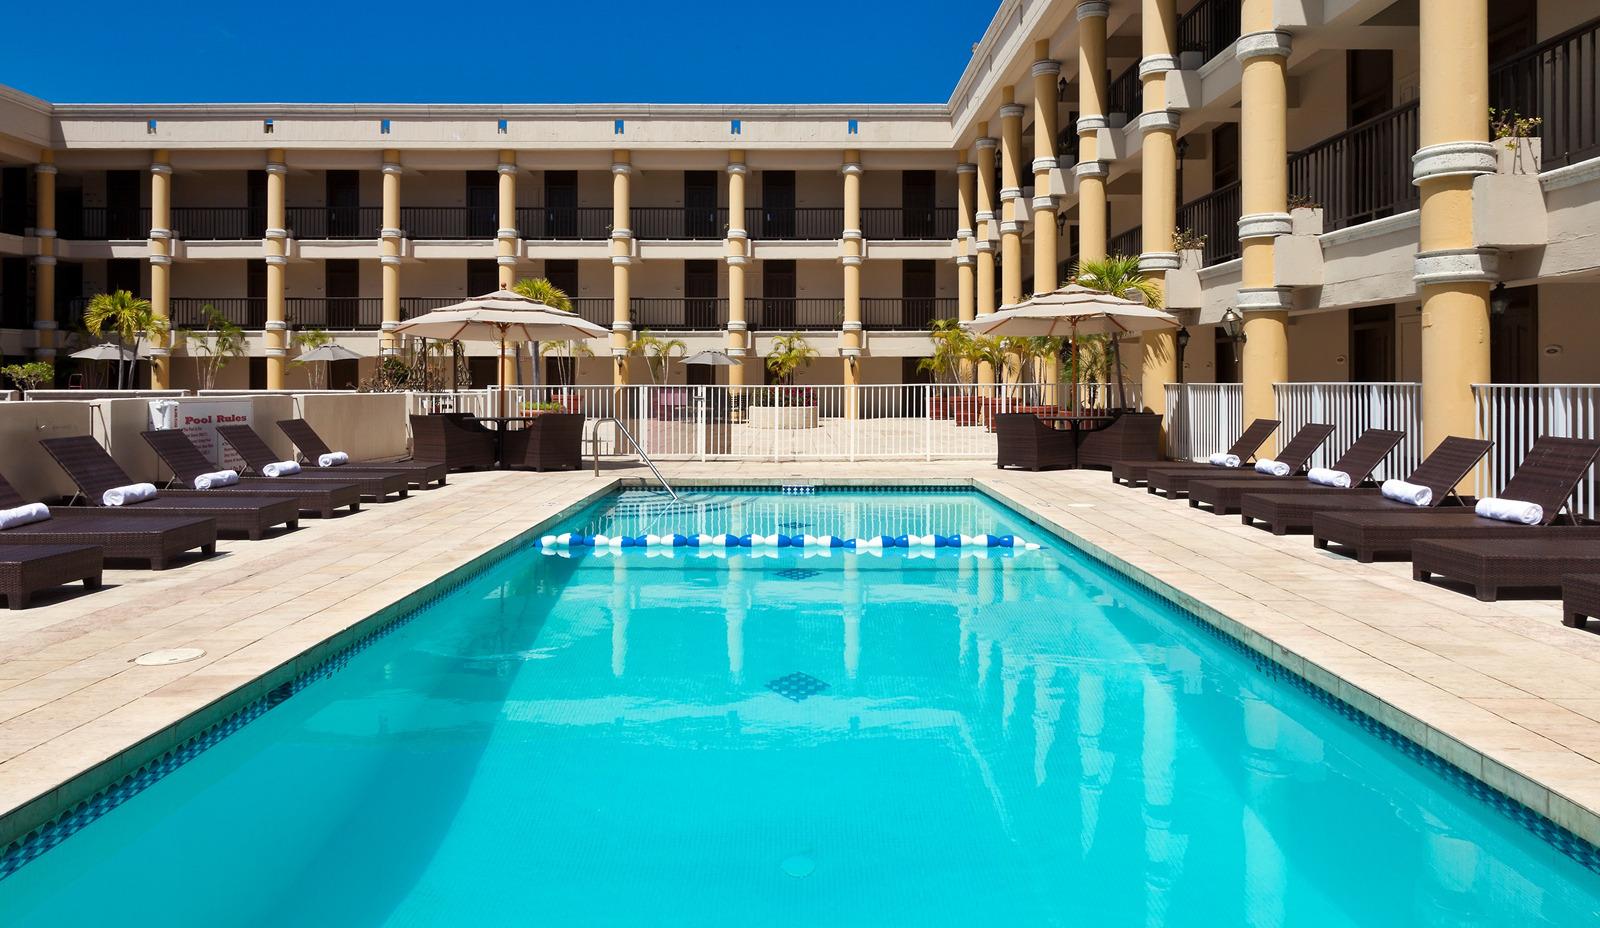 Winward Passage Hotel